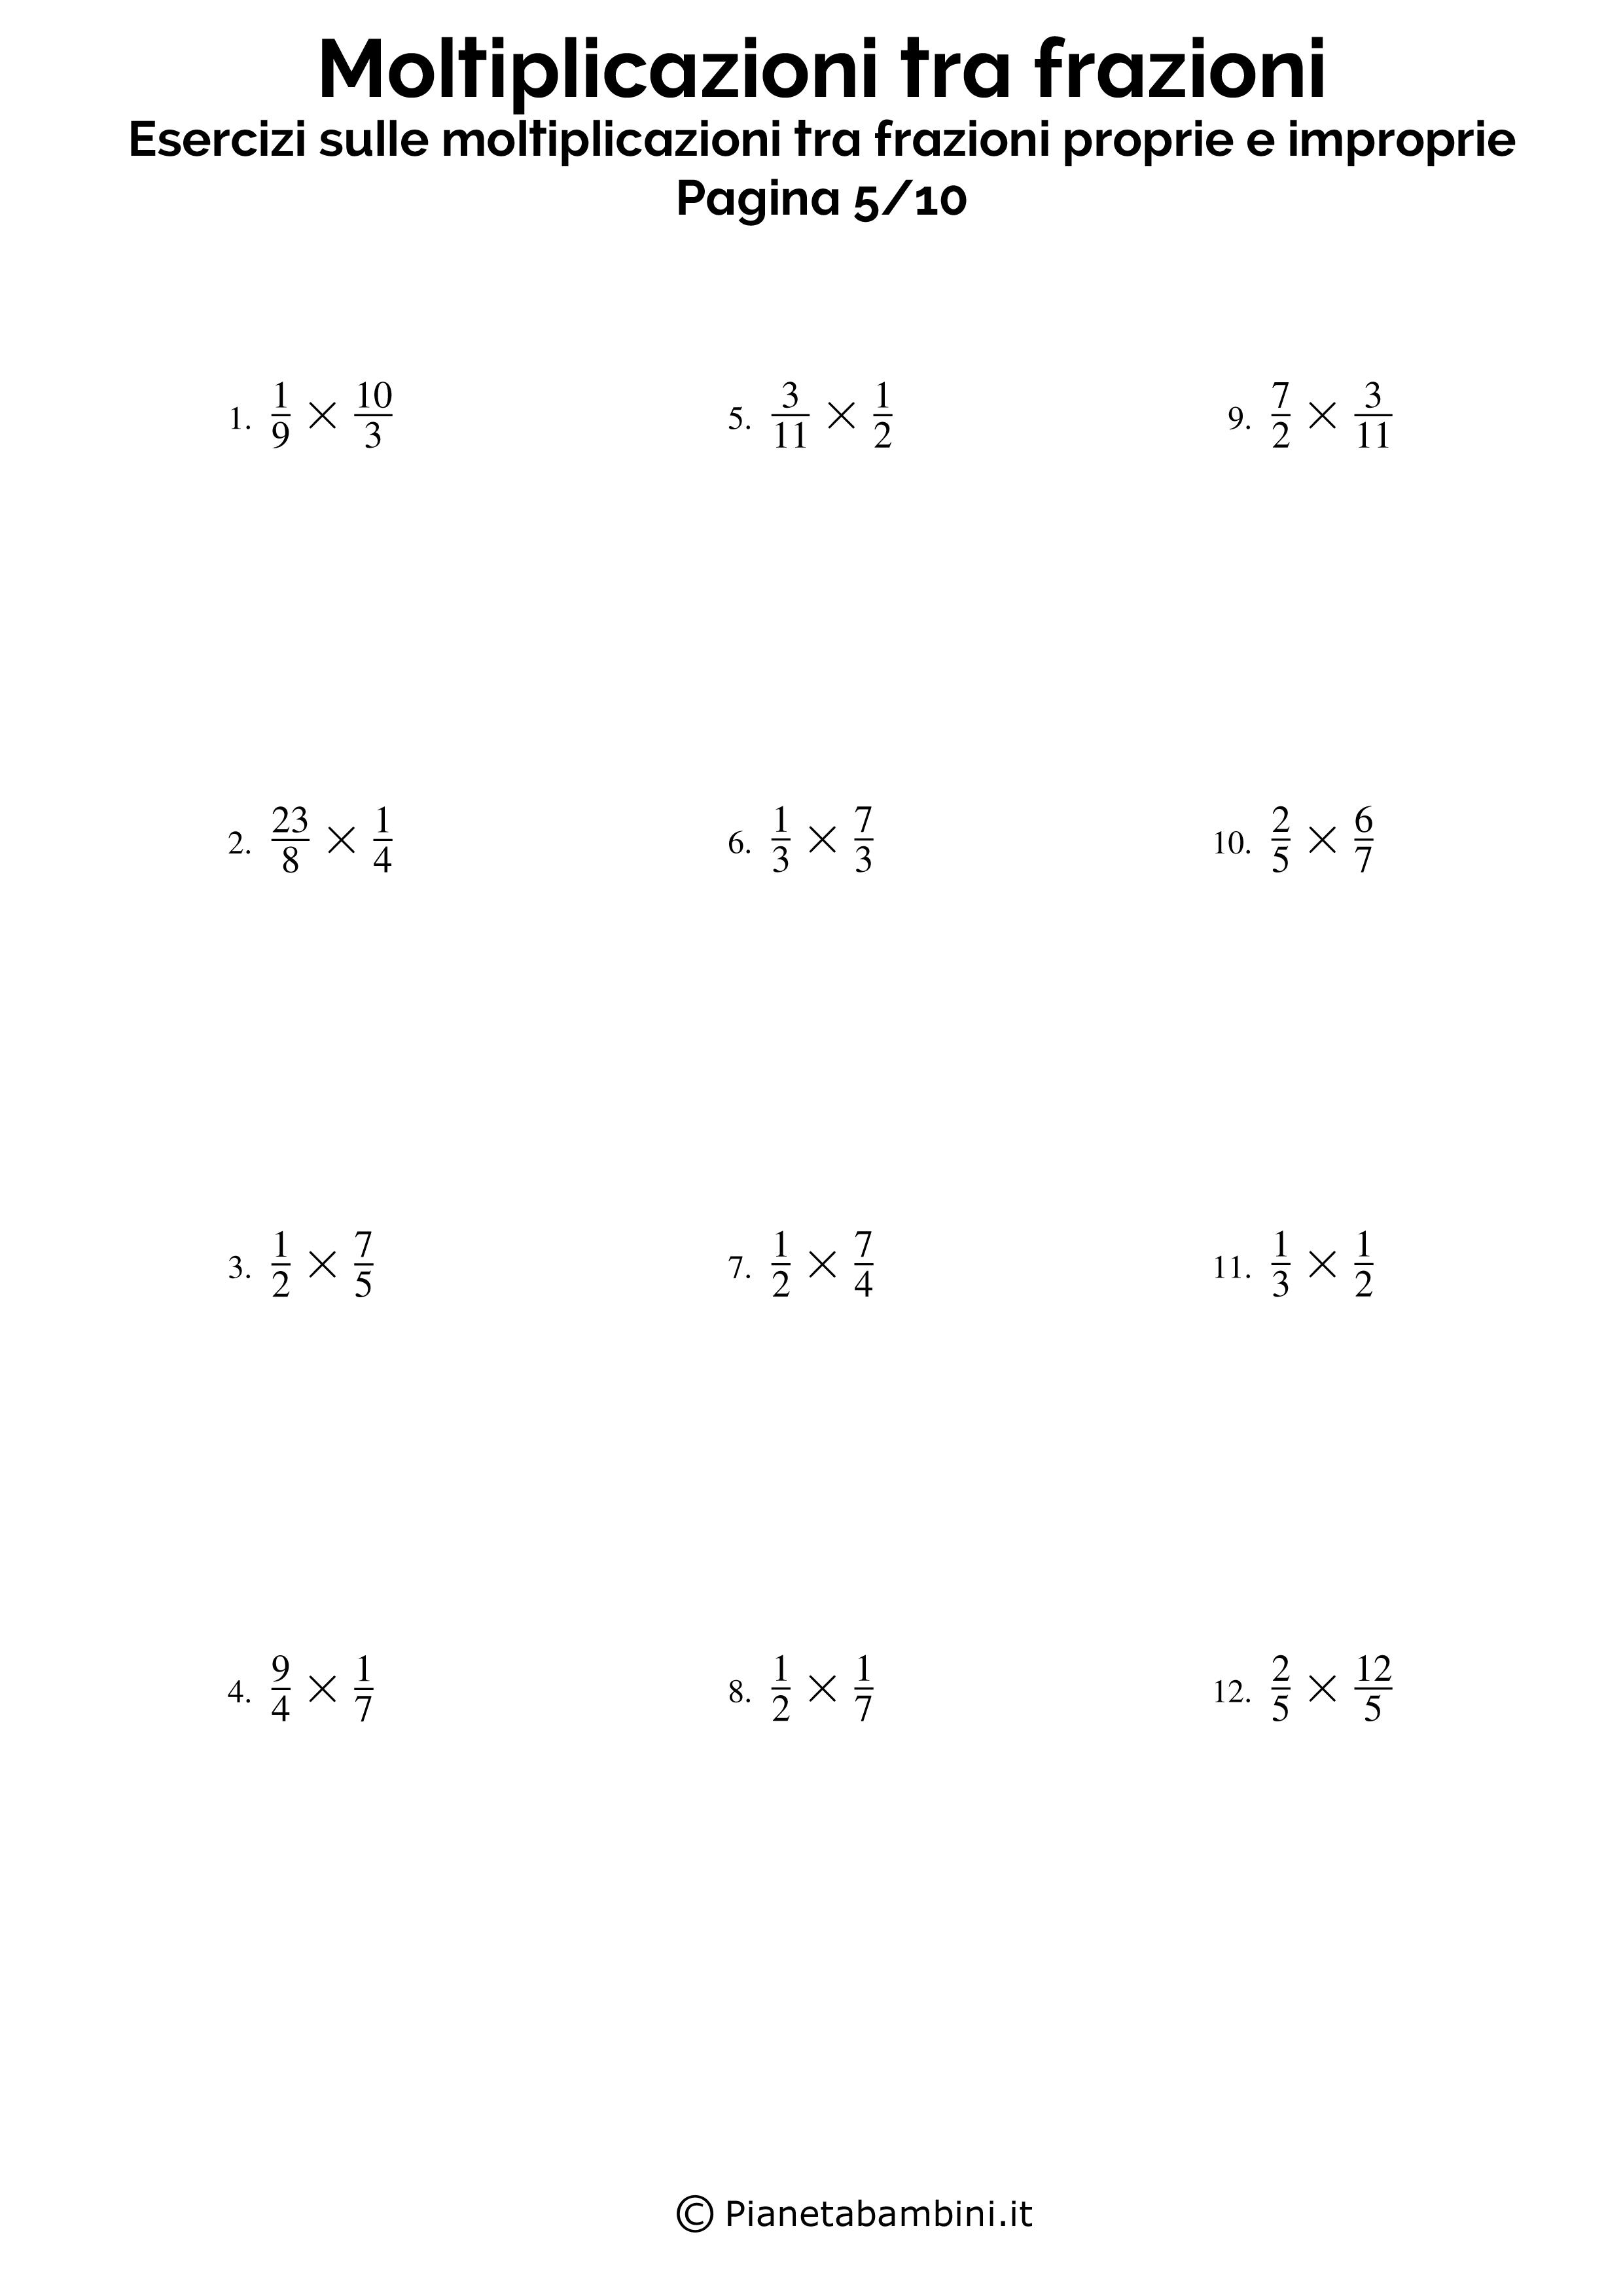 Moltiplicazioni-Frazioni-Proprie-Improprie_05